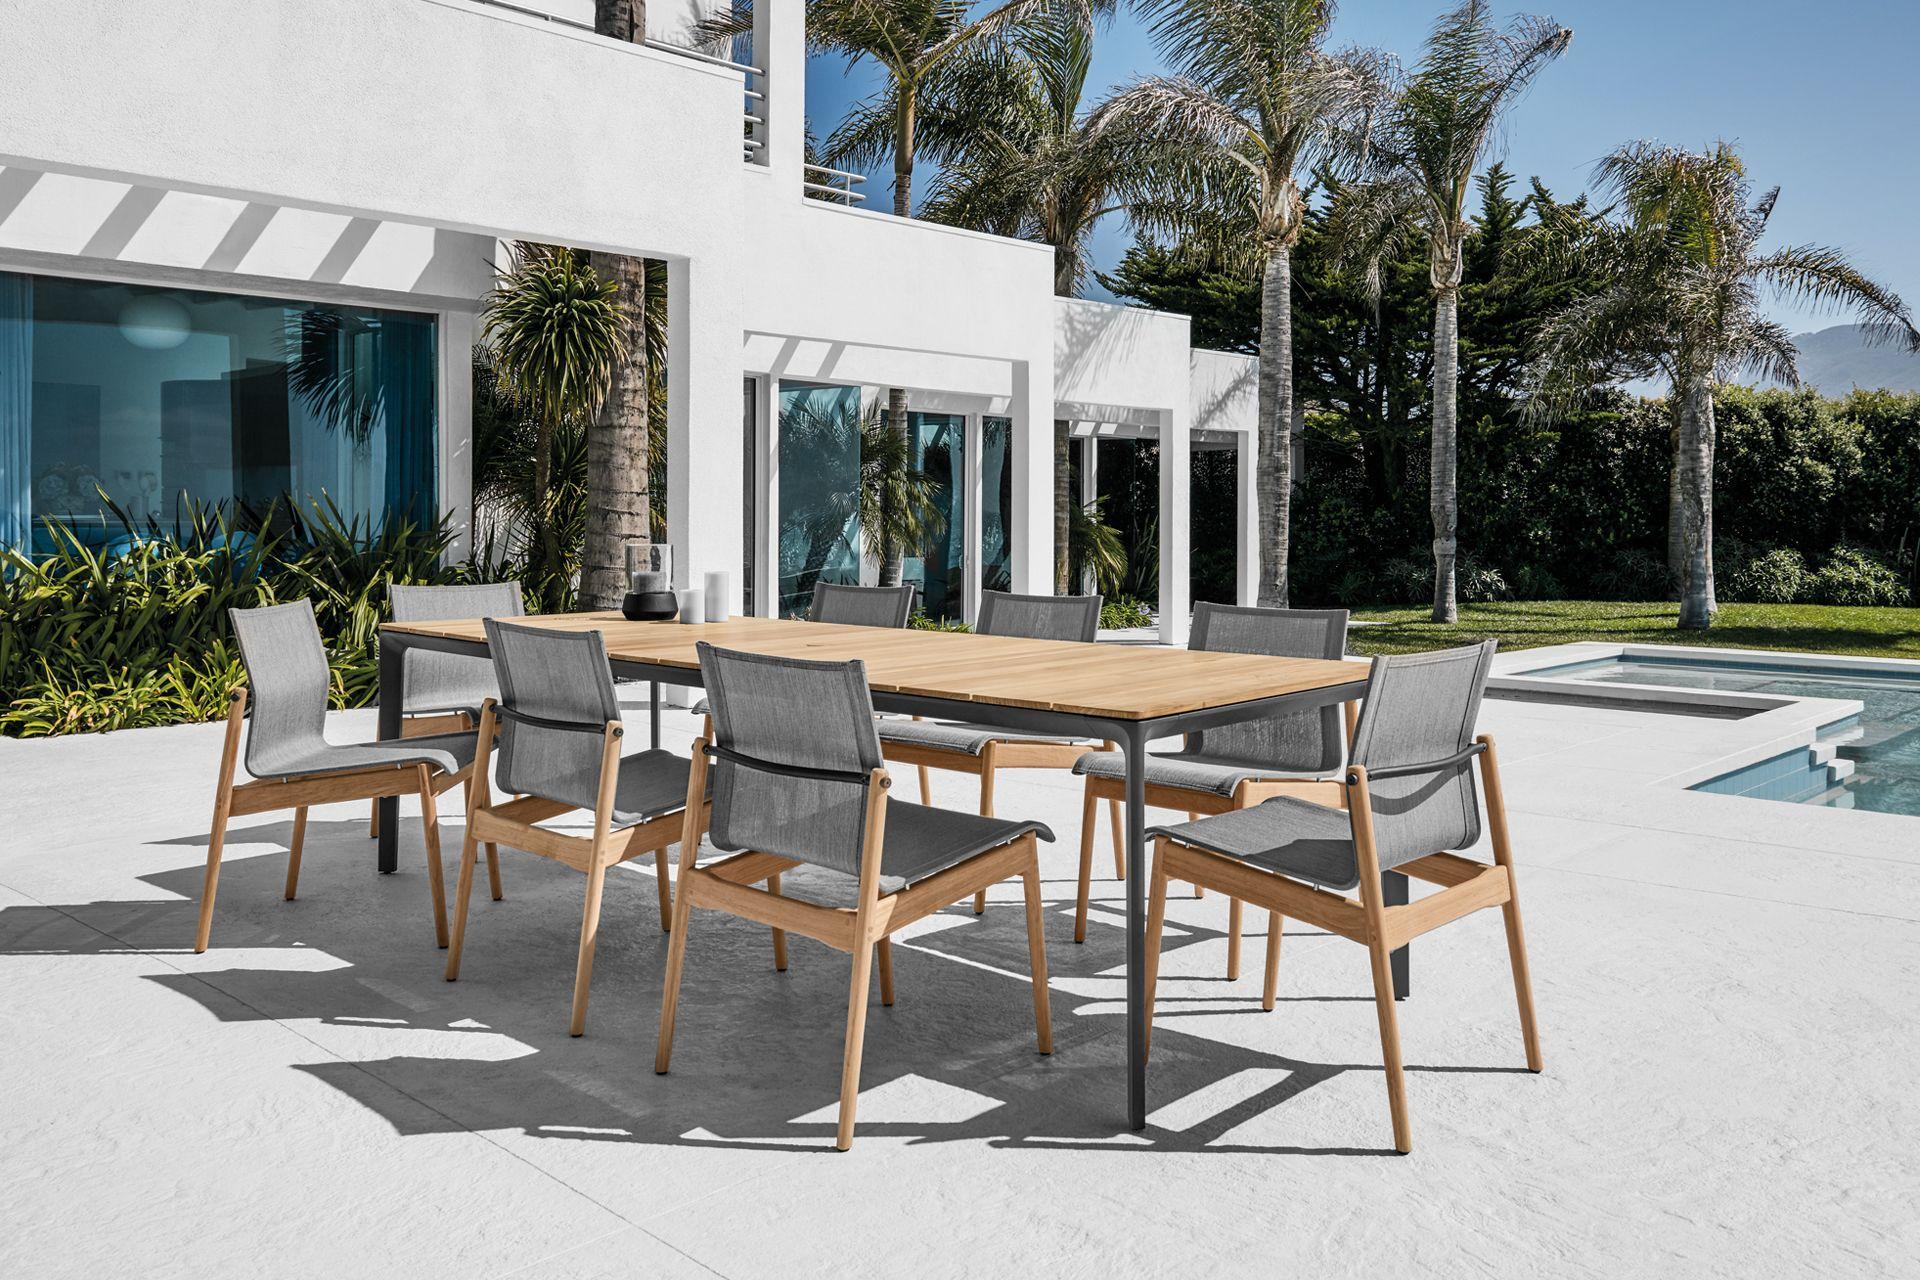 Patio 1 Outdoor Furniture | Luxury outdoor furniture ... on Fine Living Patio Set id=88912